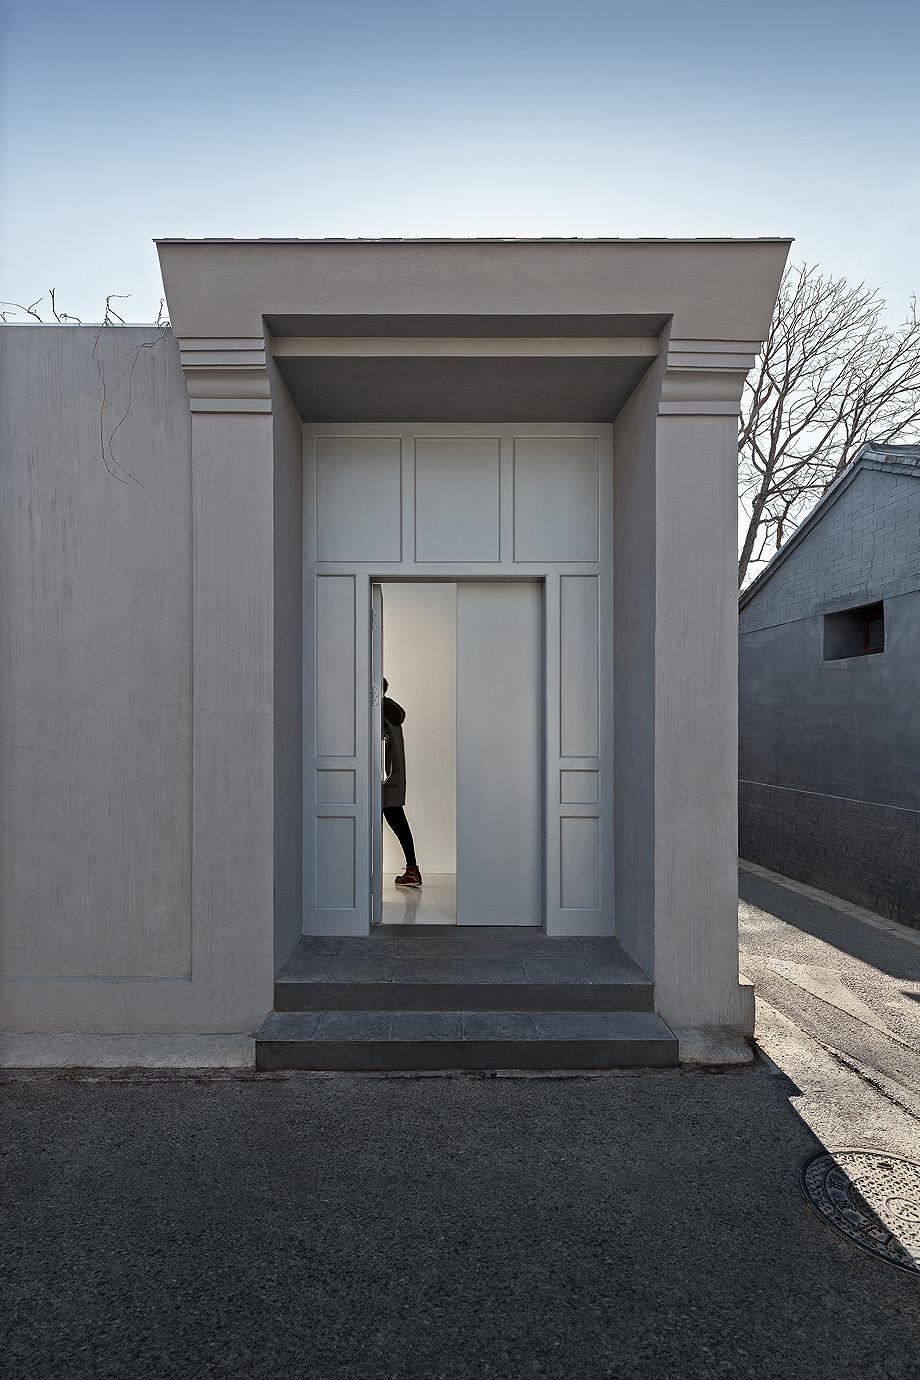 01 mirror garden de archstudio - foto © Wang Ning